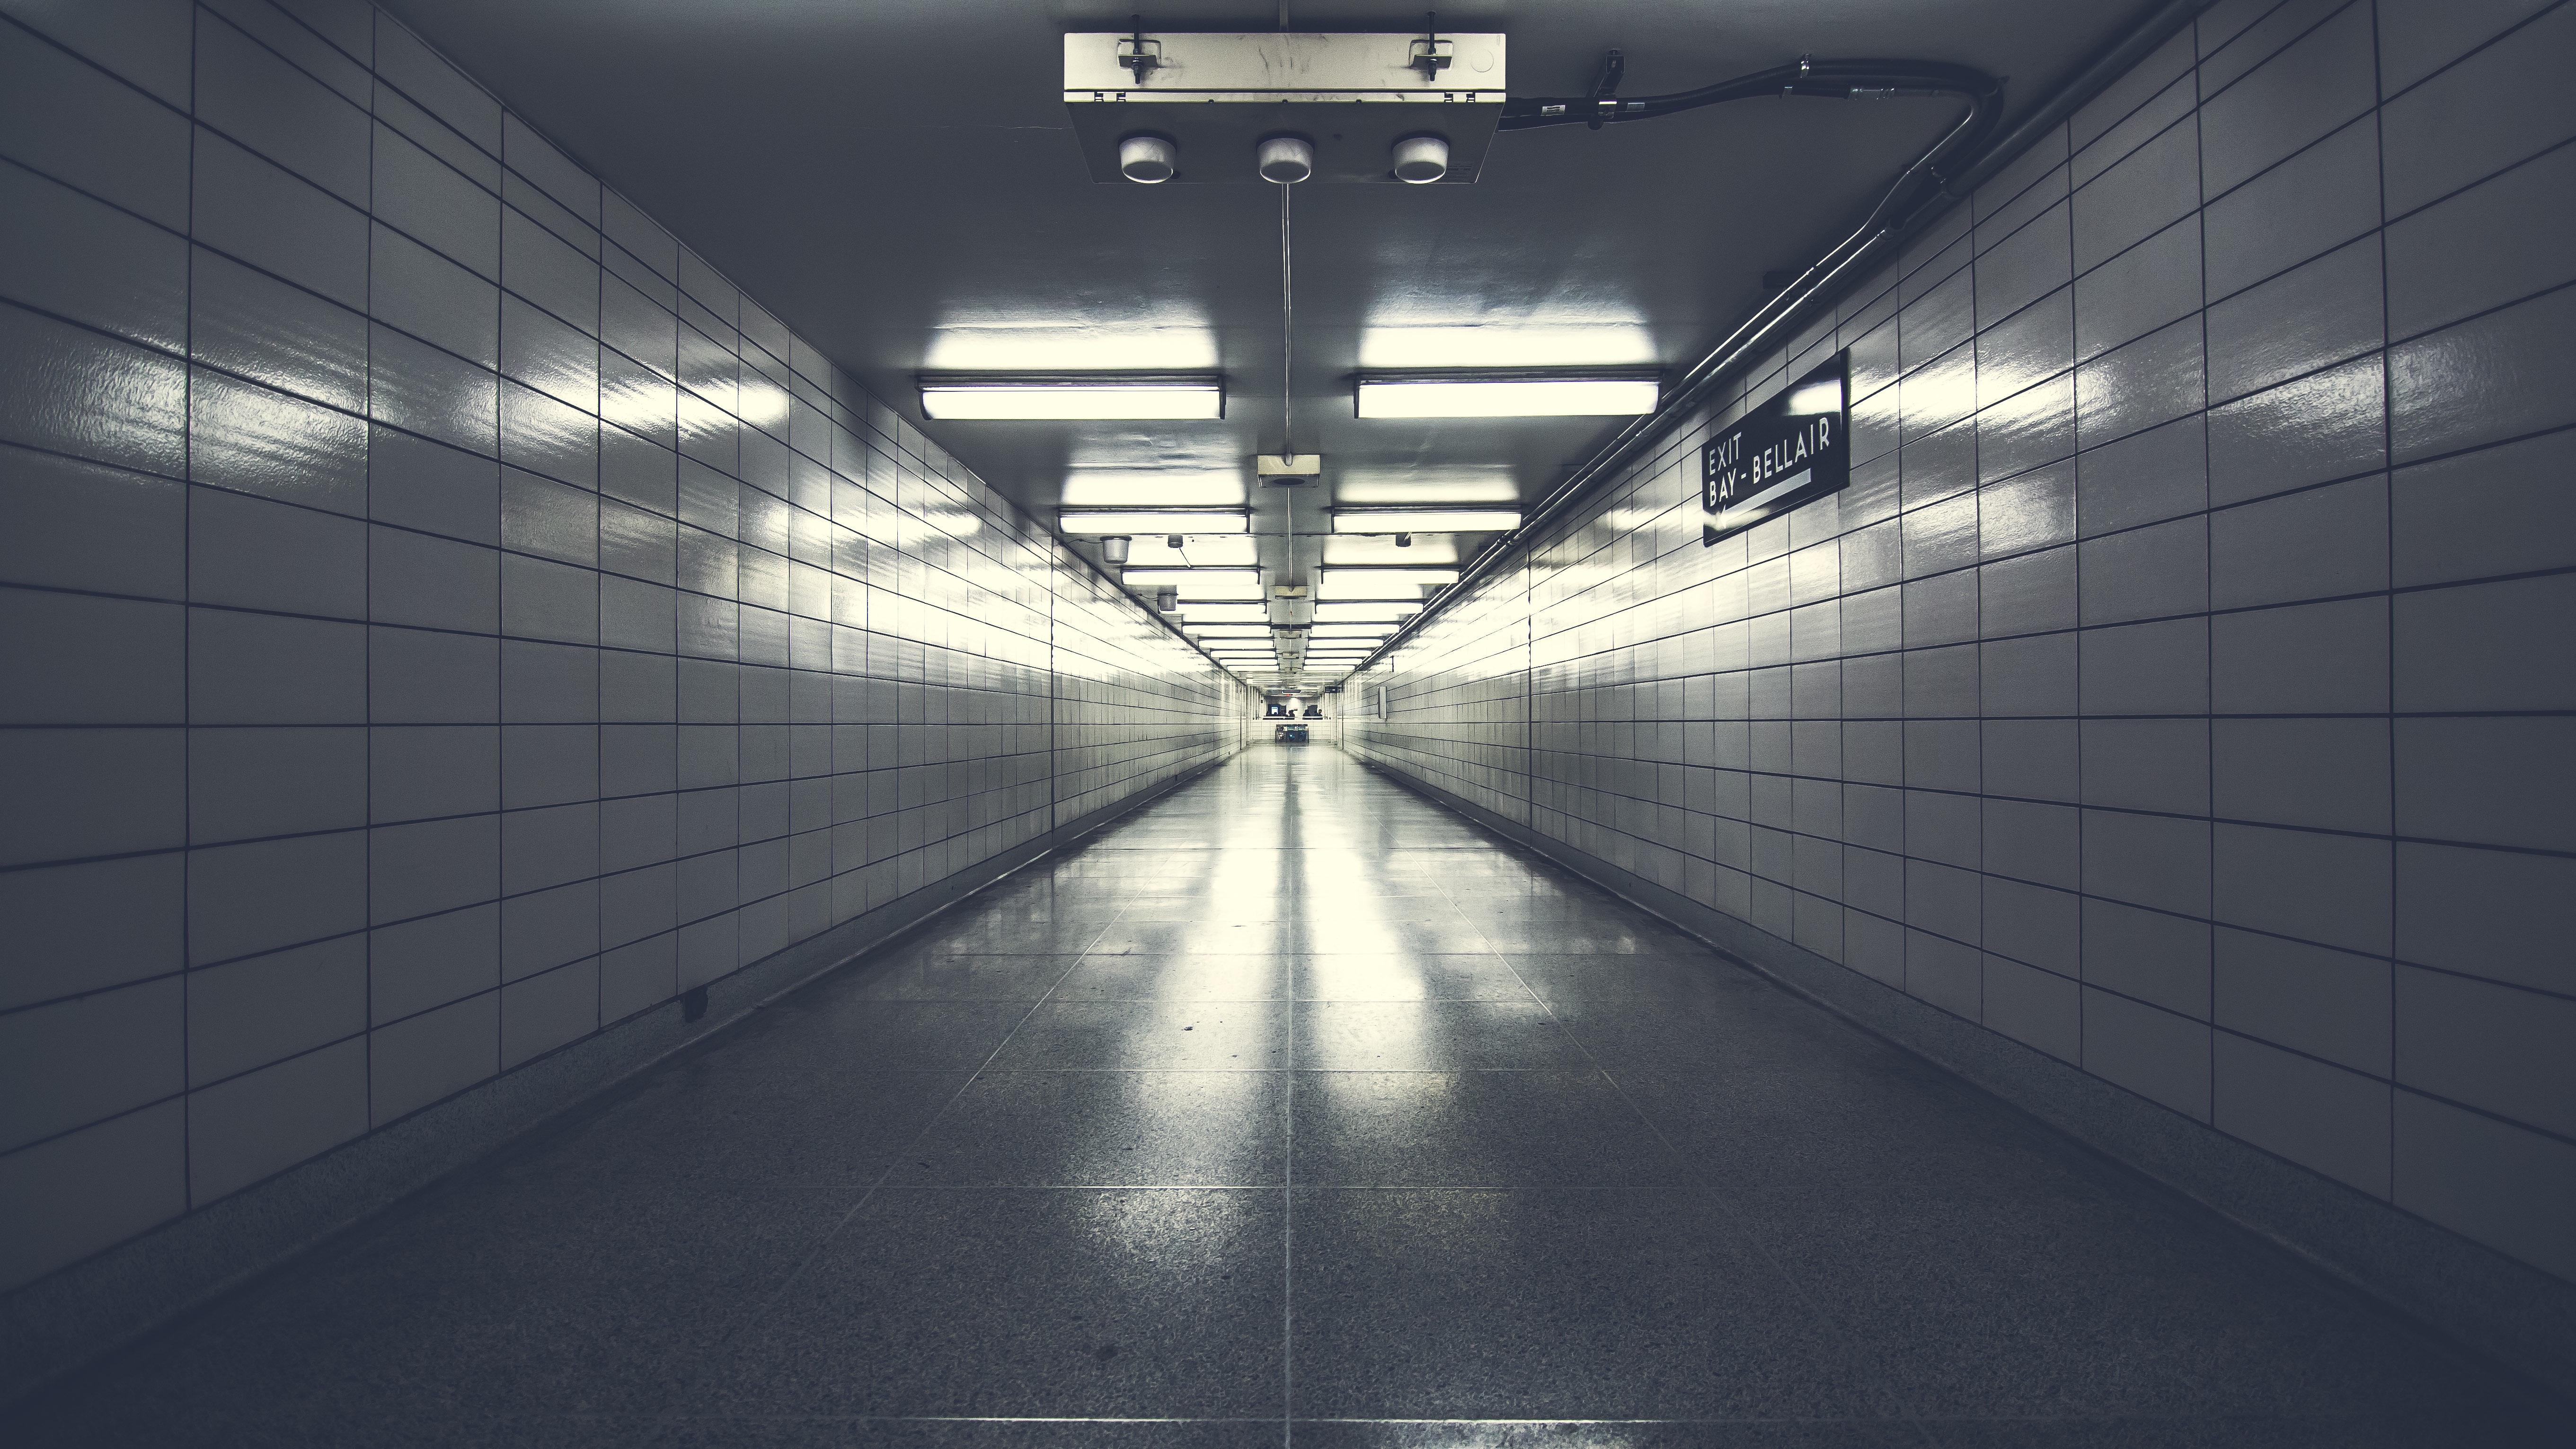 Photo Of Train Station Hallway